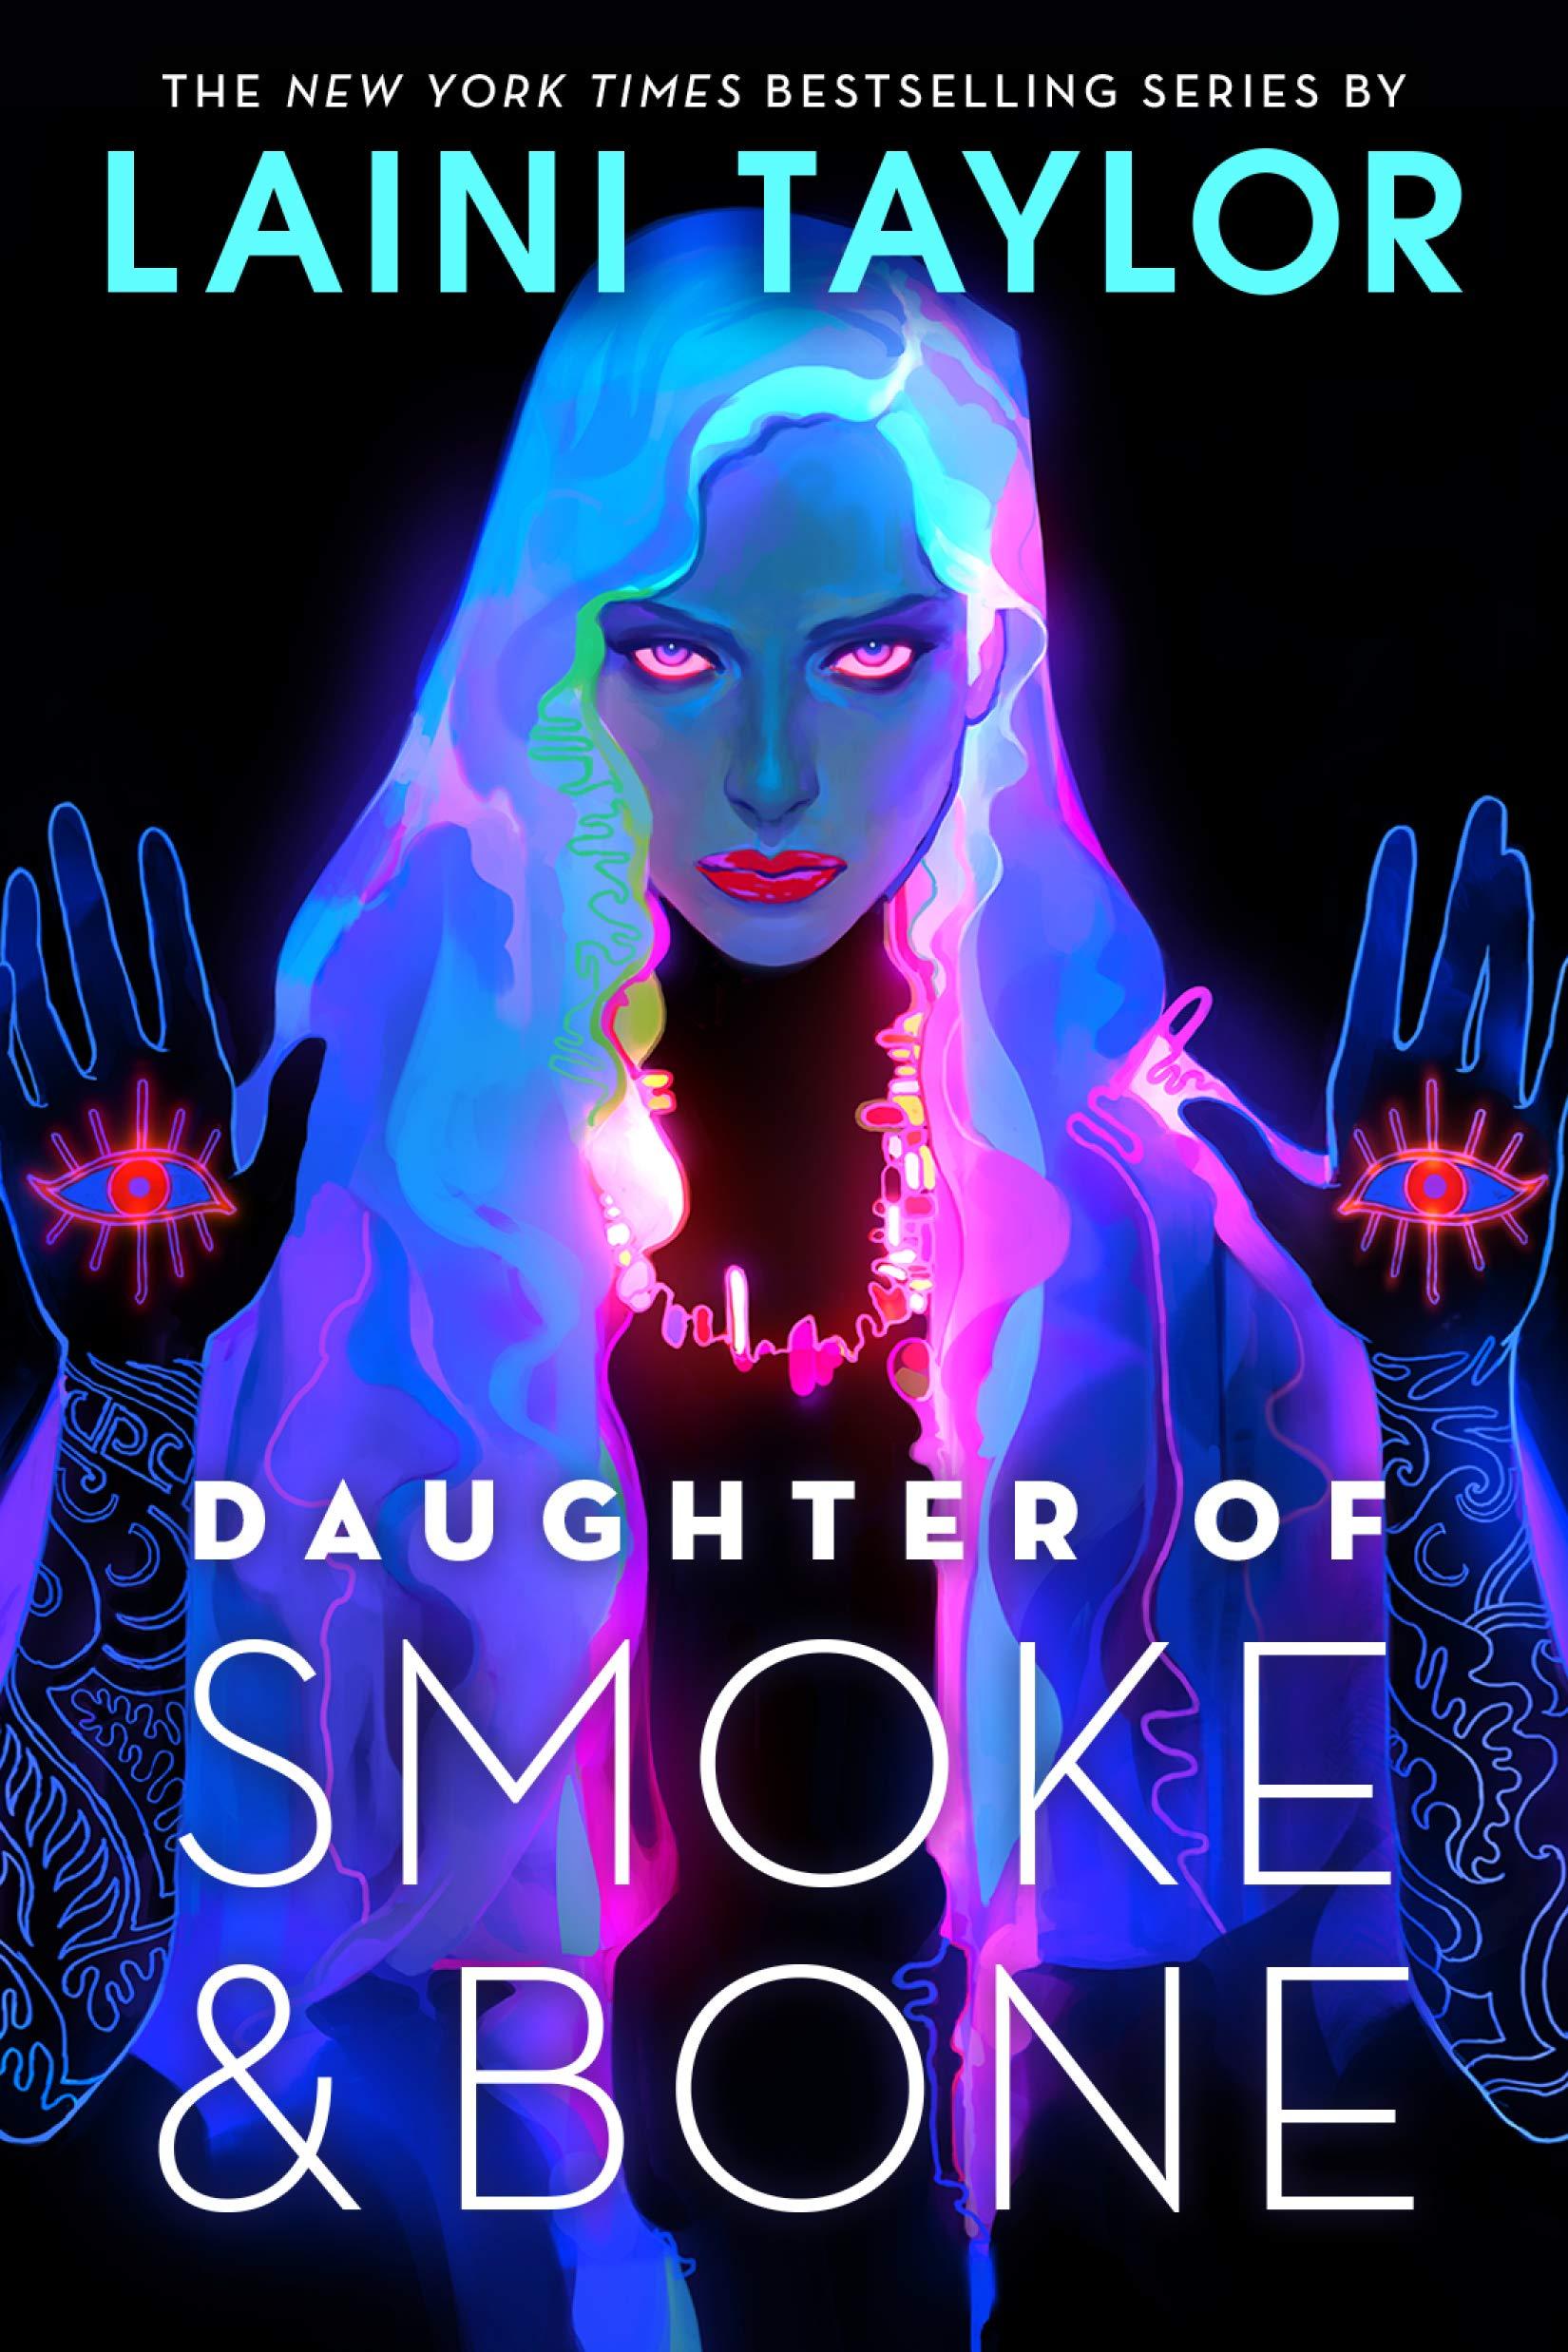 Books like Twilight - Daughter of Smoke and Bone